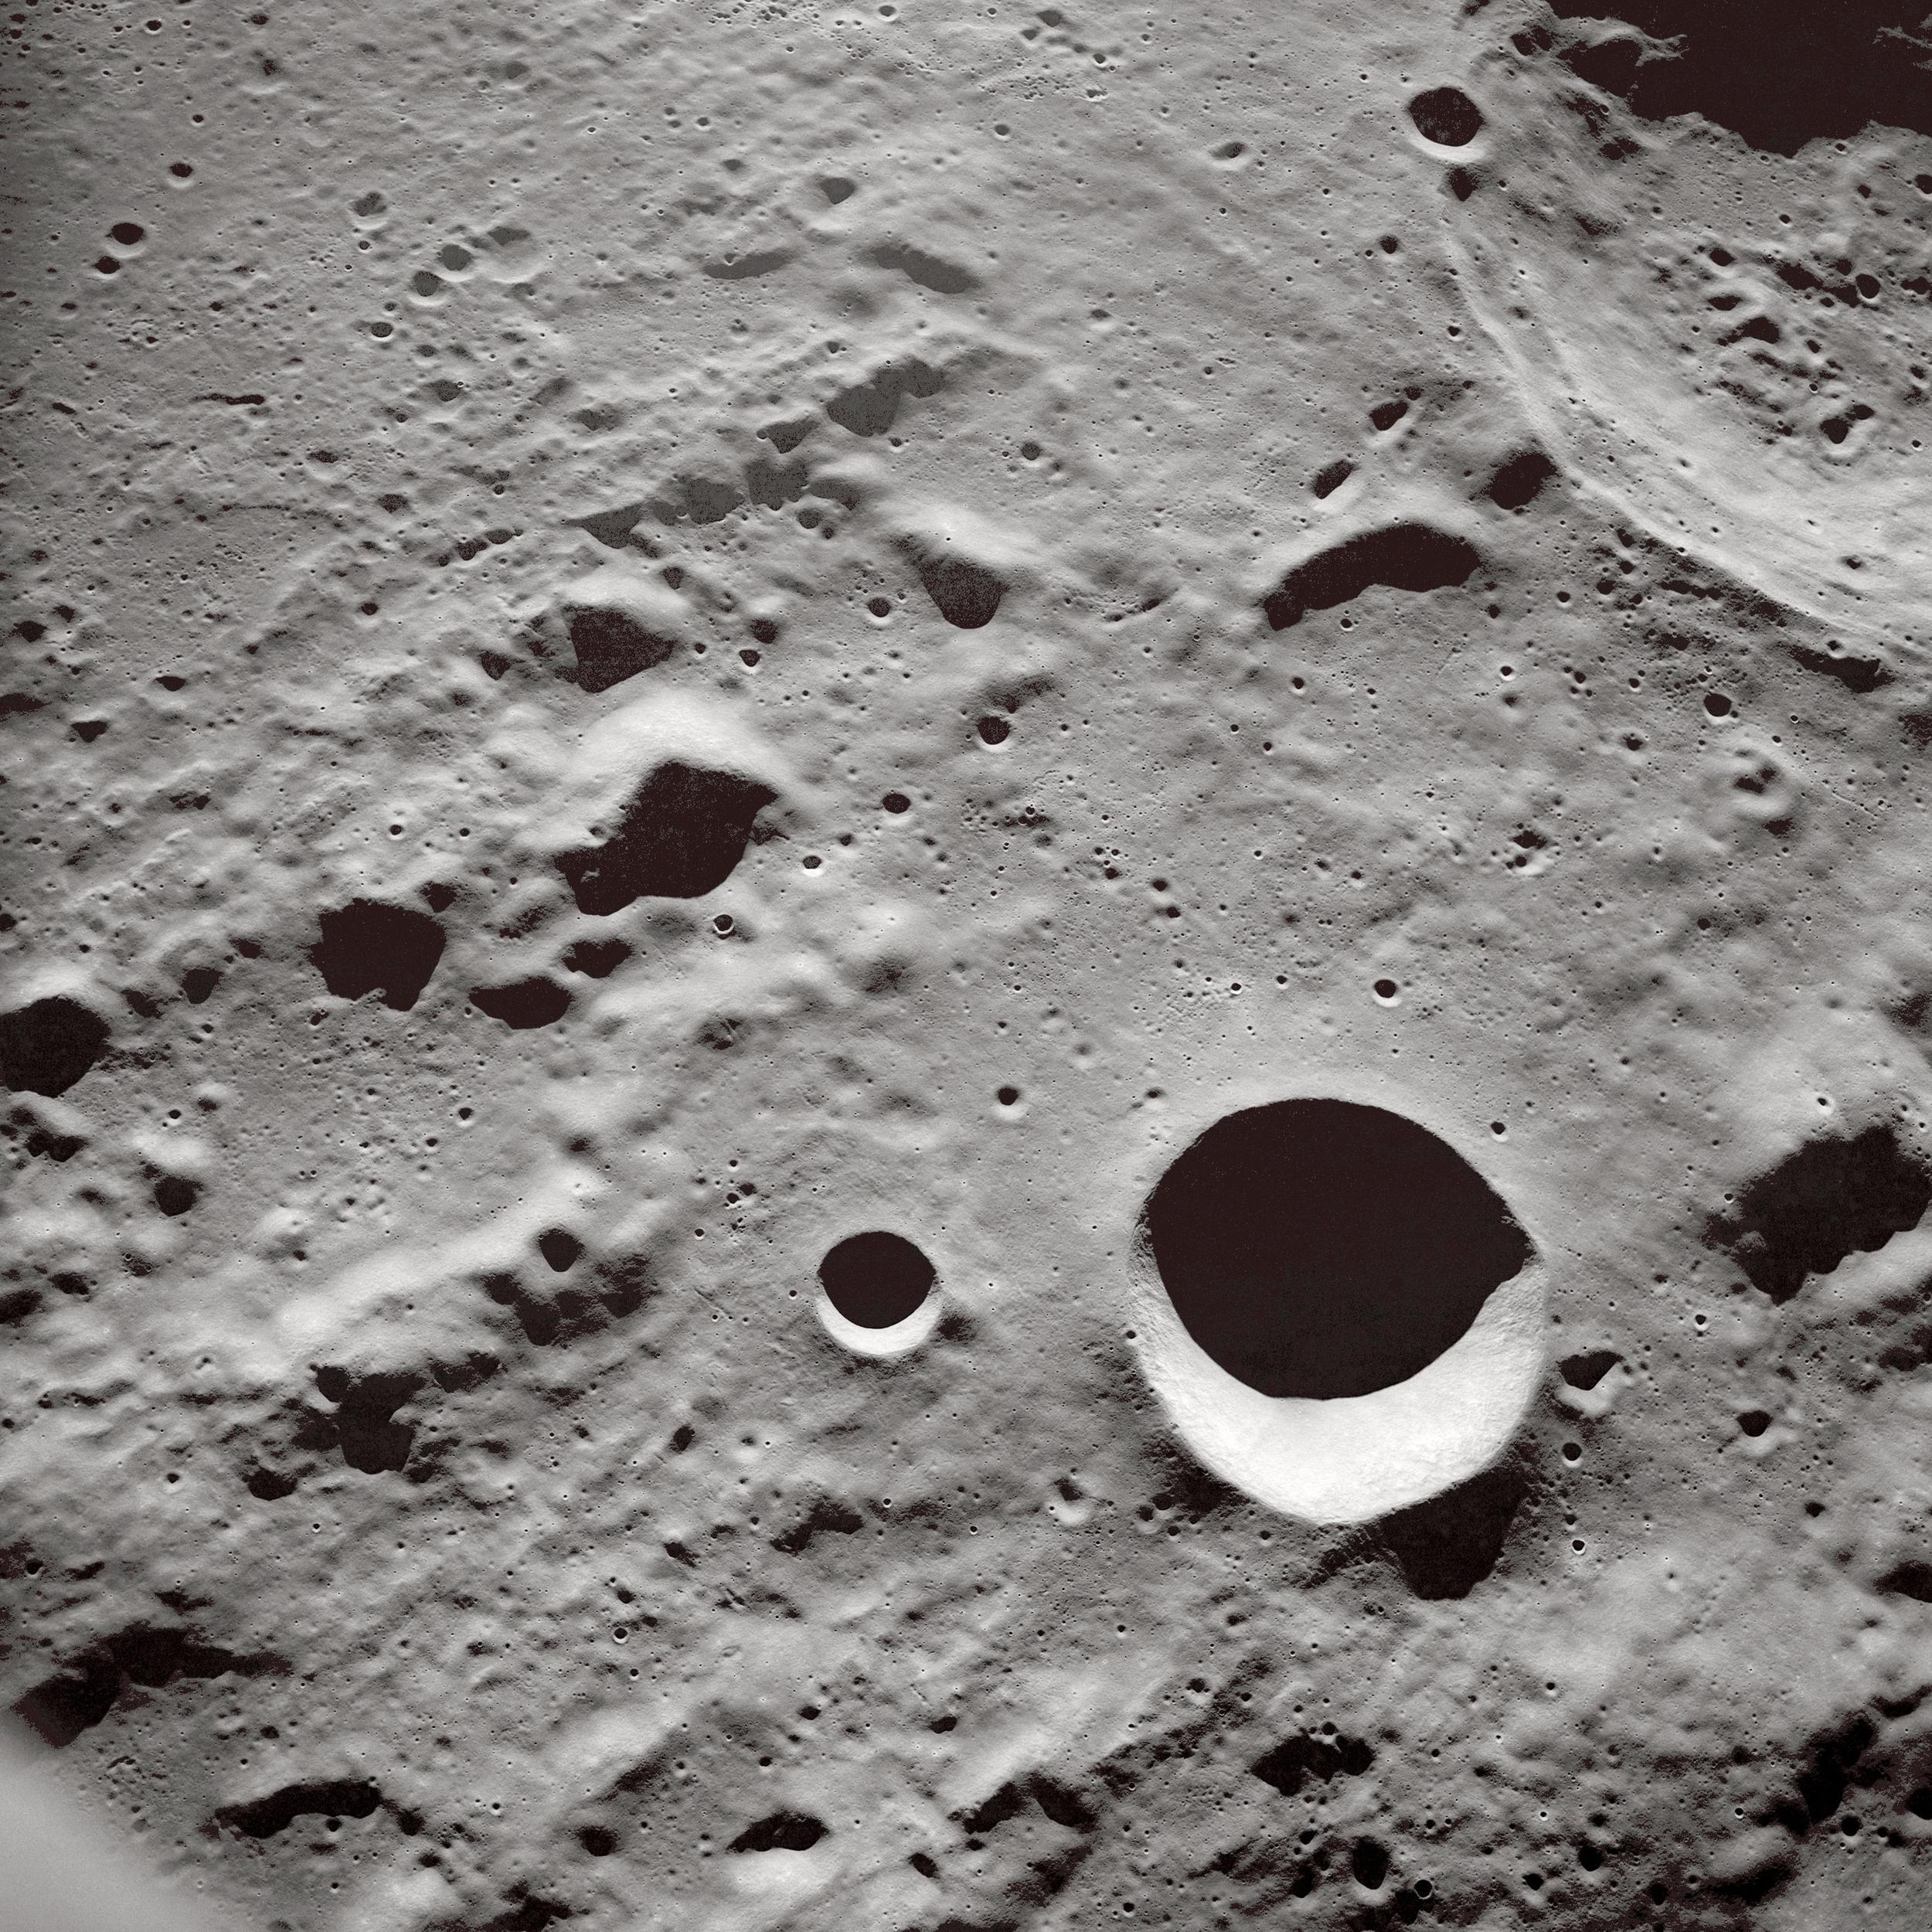 Long_Shadows_on_the_Lunar_Surface_-_GPN-2000-001485.jpg